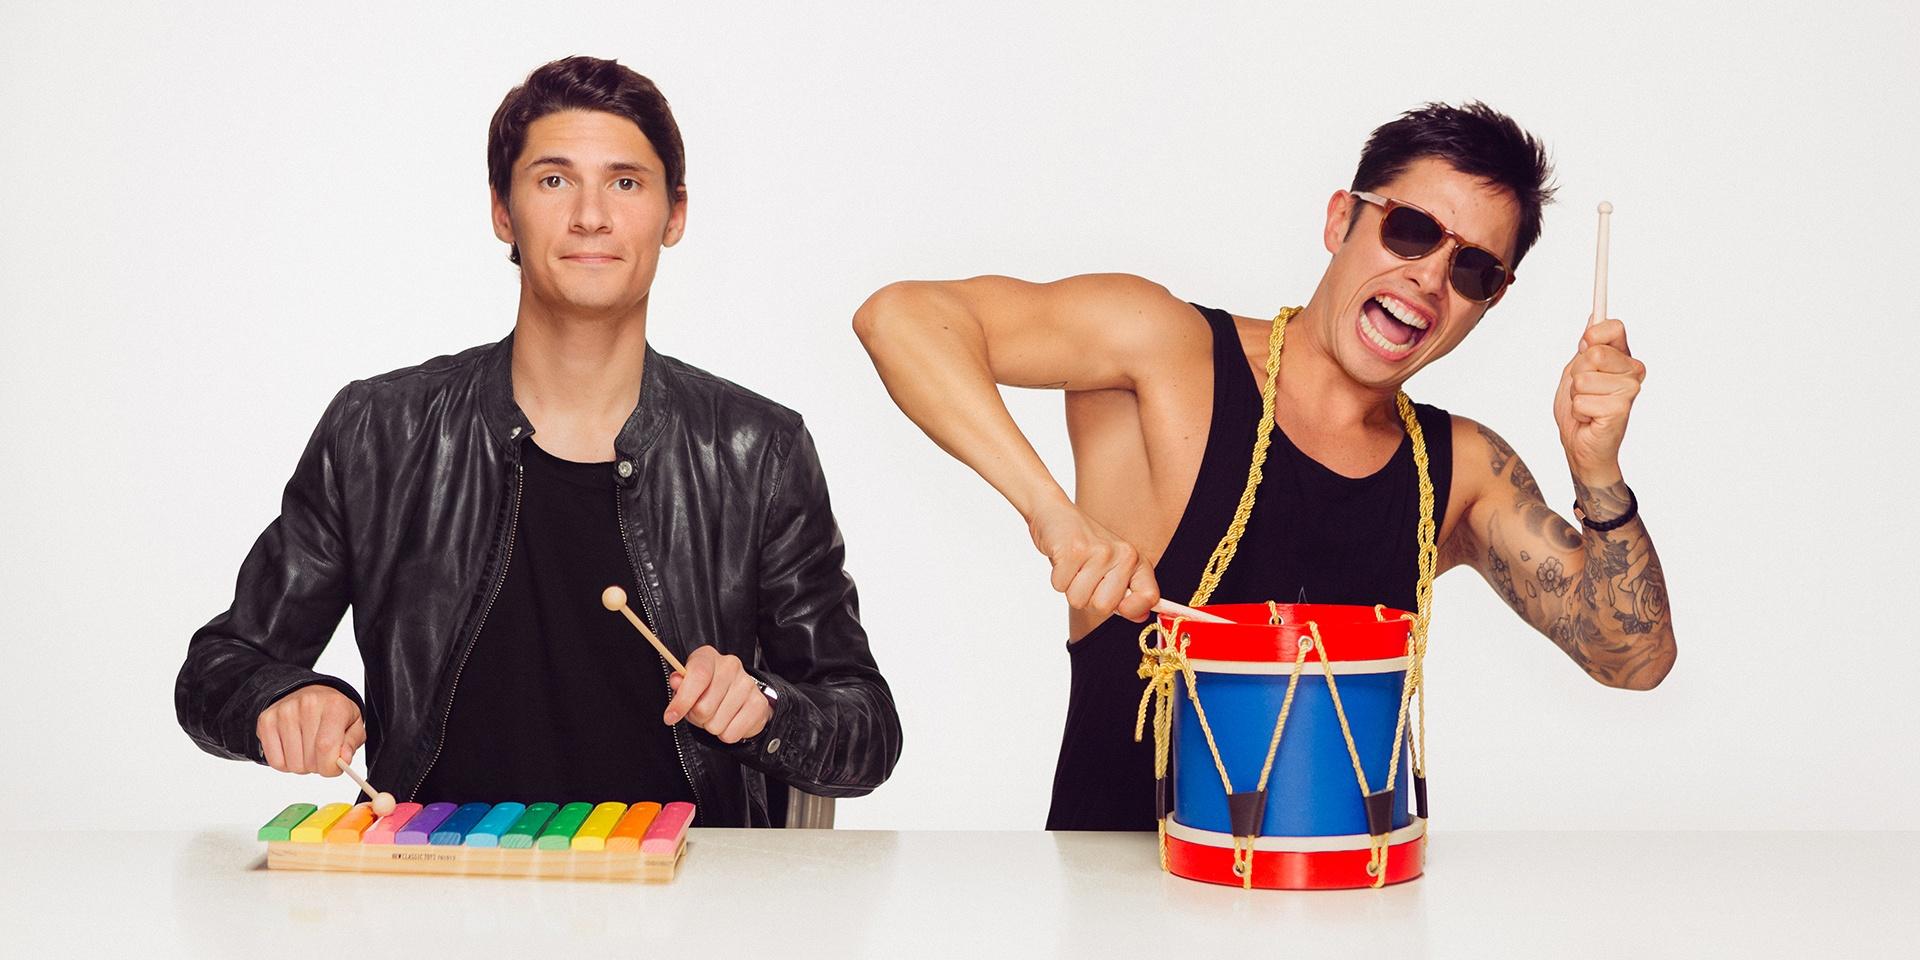 DJ duo Bassjackers to make their CÉ LA VI debut in Singapore